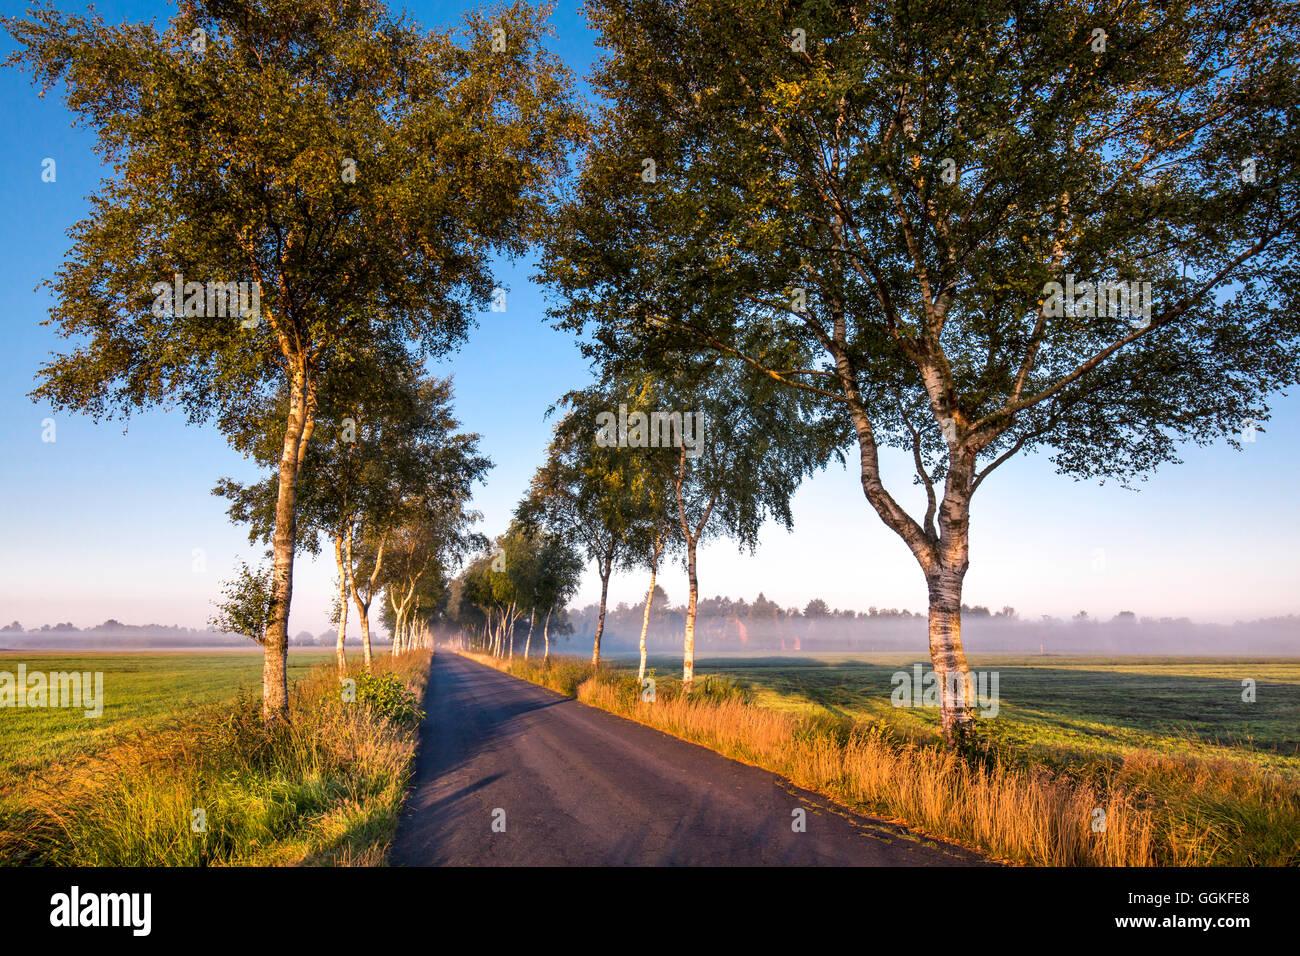 Birch tree alley, Worpswede, Teufelsmoor, Lower Saxony, Germany - Stock Image